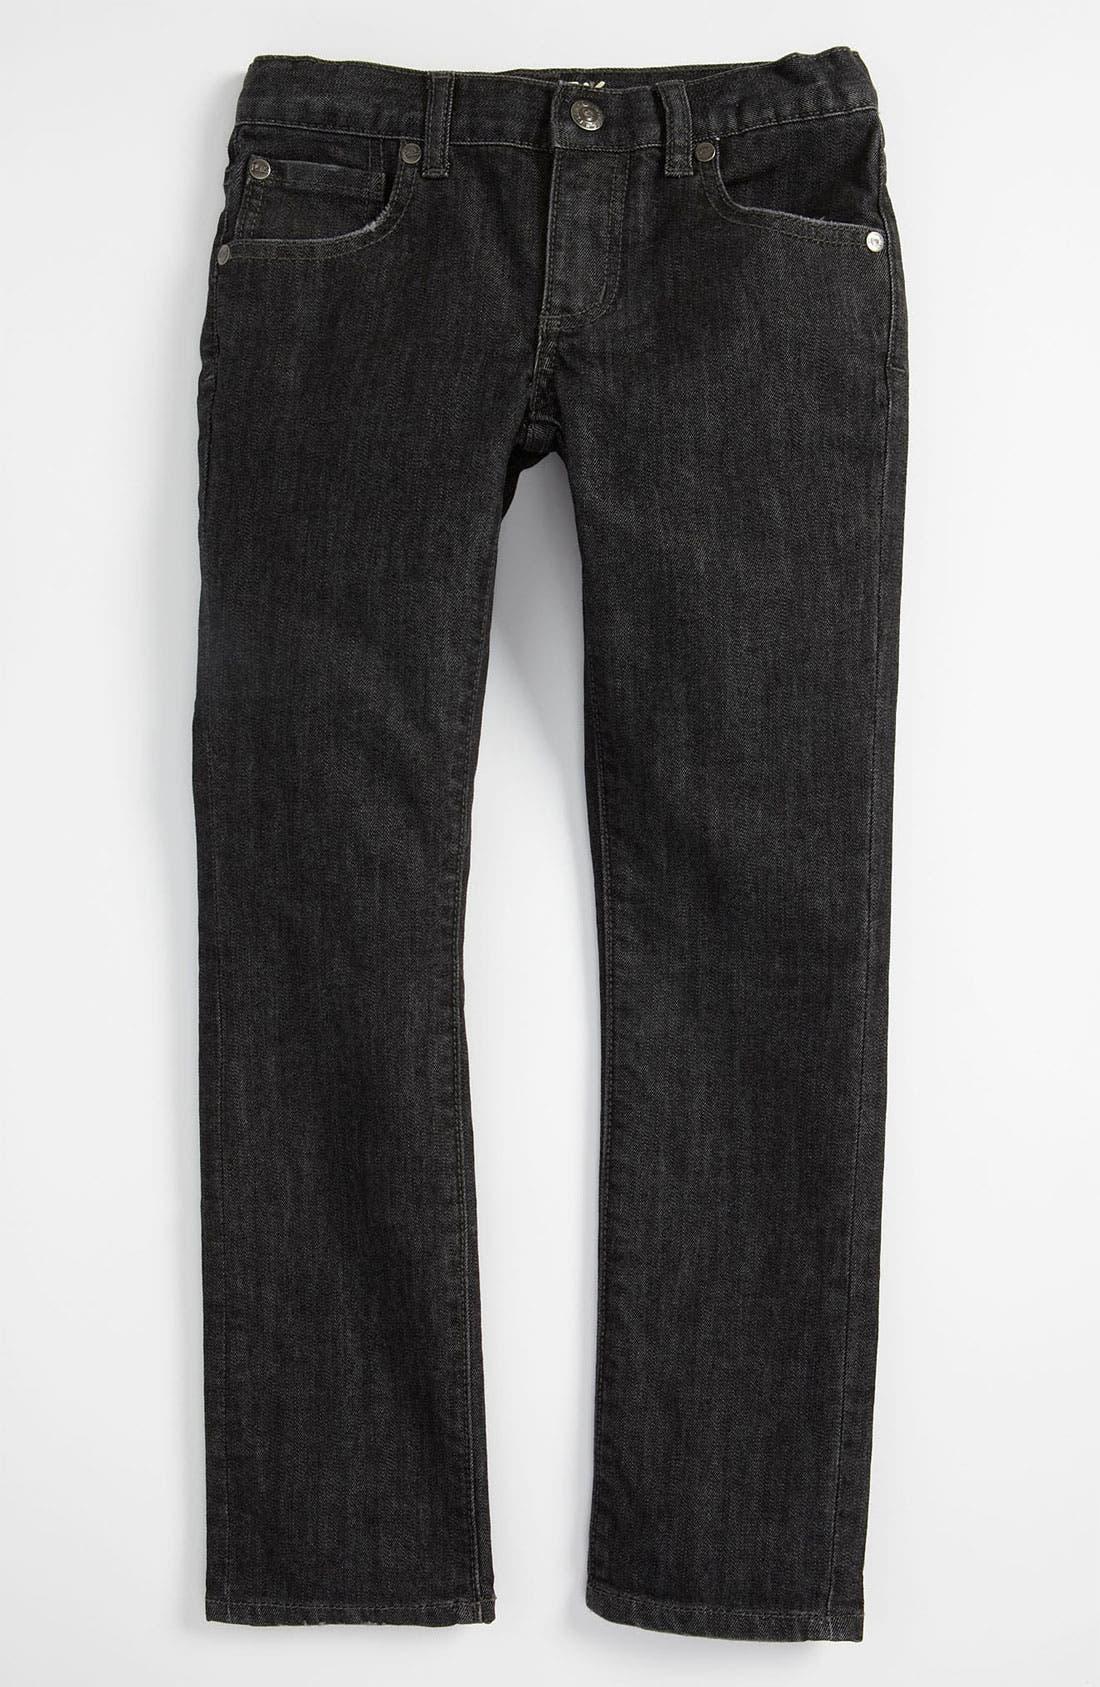 Alternate Image 2  - Peek 'Slouch' Jeans (Toddler, Little Boys & Big Boys)